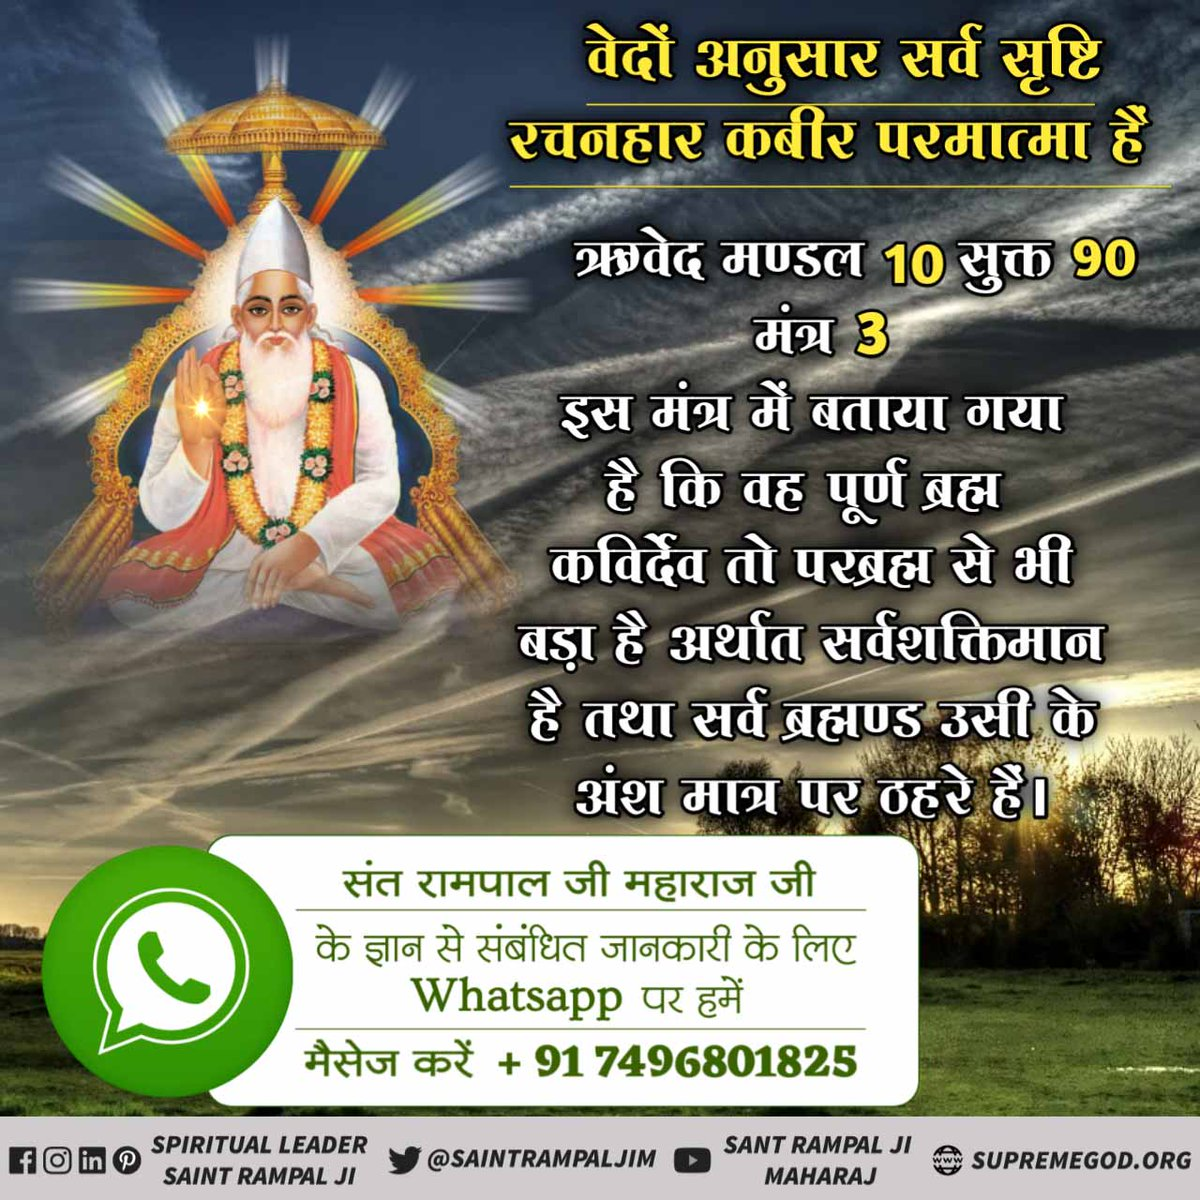 #ThankYouBTSAESO #GodMorningWednesday #wednesdaythought  God Kabir himself is the creator of all, he himself do all the things but he gives his credit to other gods and trinity!!... SadGuru Sant Rampal Ji Maharaj